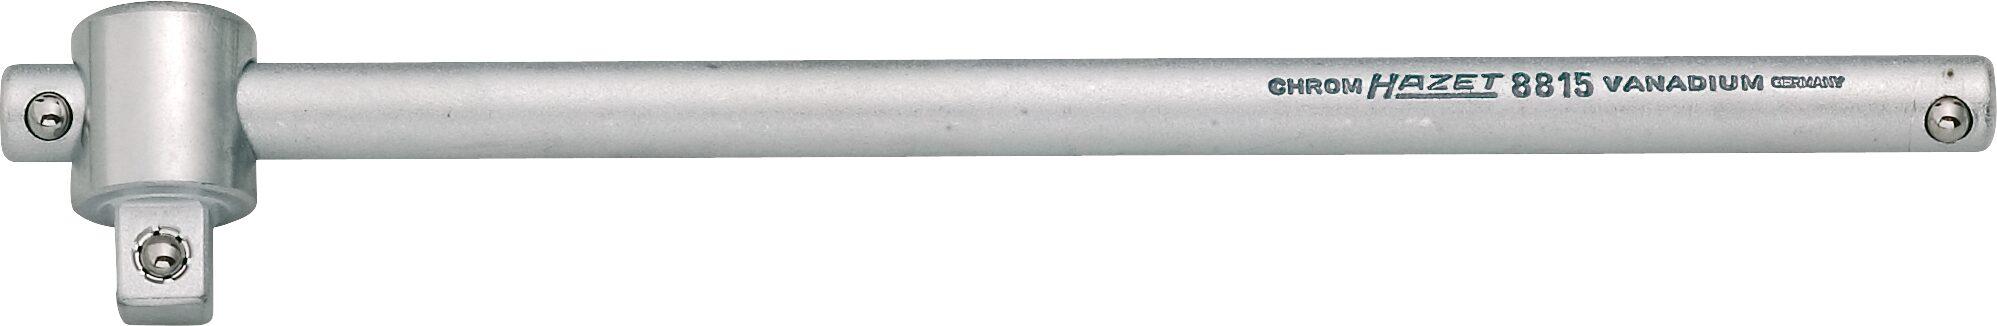 HAZET Quergriff 8815 ∙ Vierkant massiv 10 mm (3/8 Zoll)